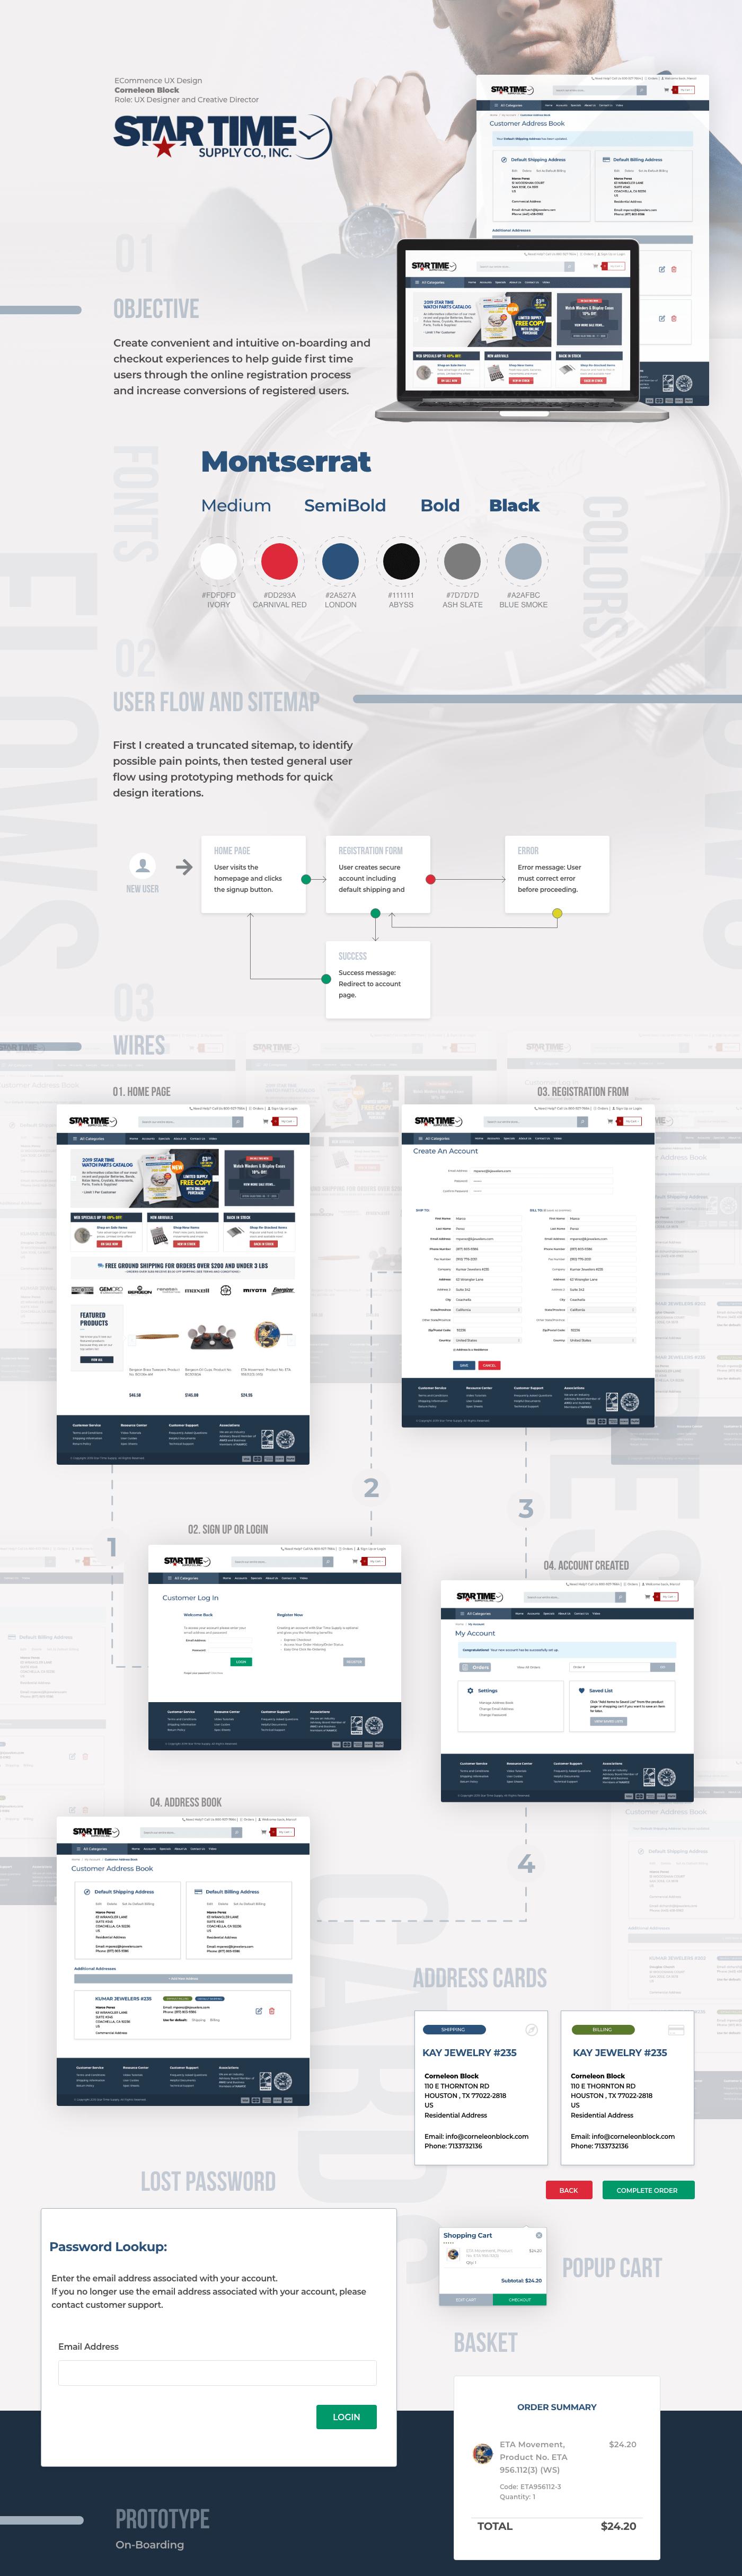 desktop Ecommerce ux